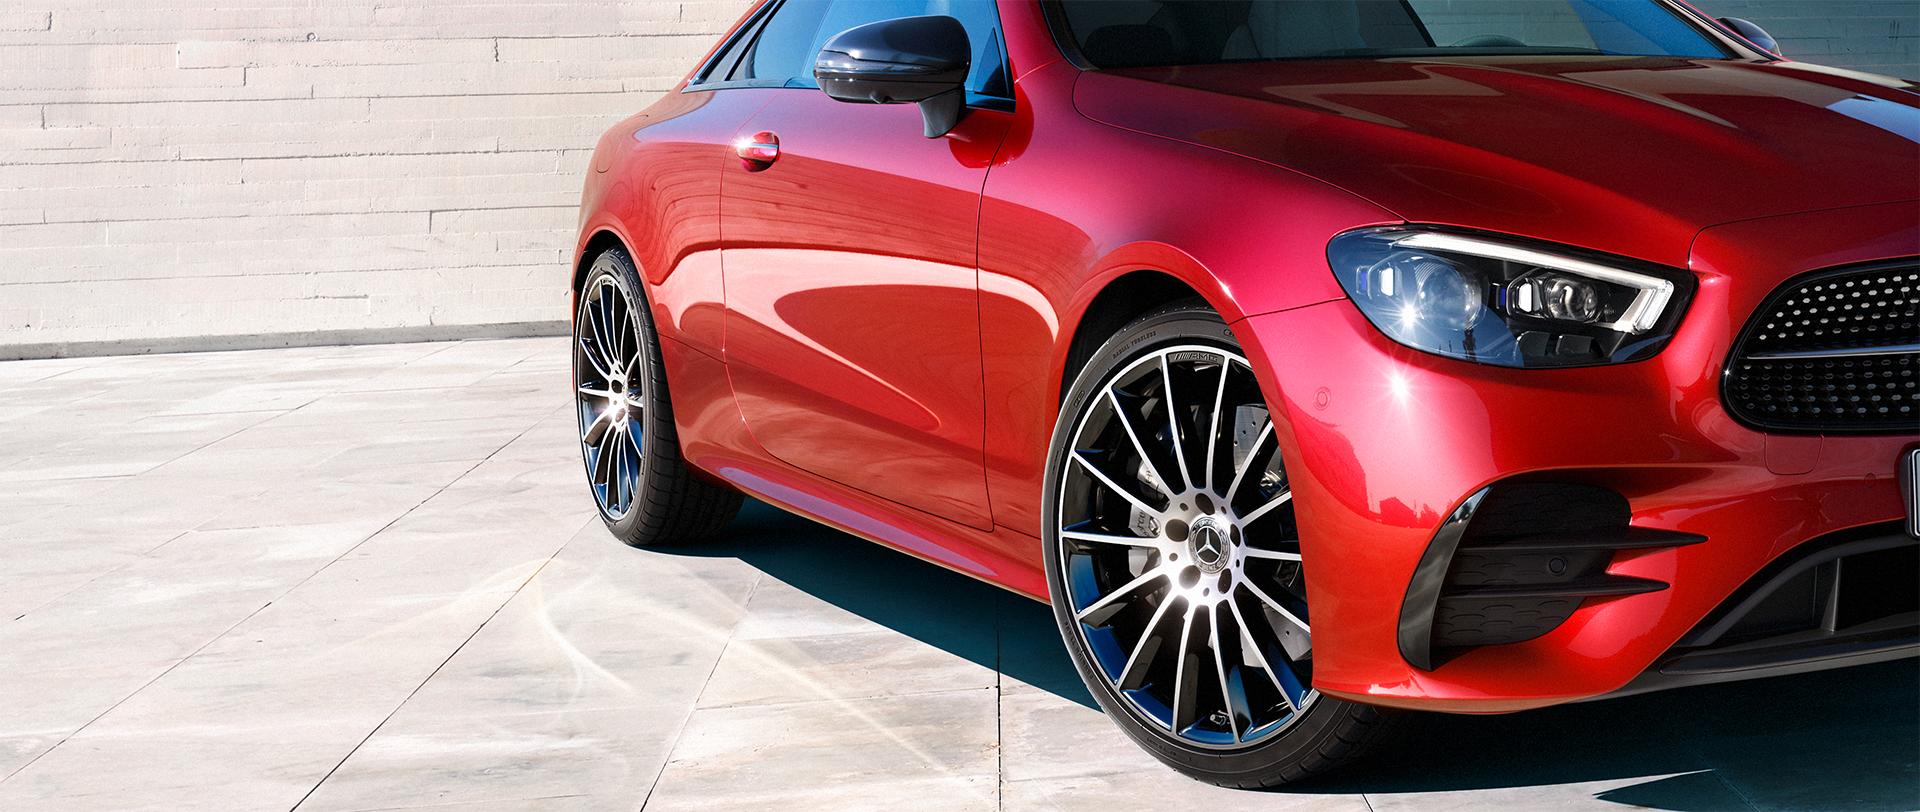 Service Special for Tires and Rims at Mercedes-Benz Burlington